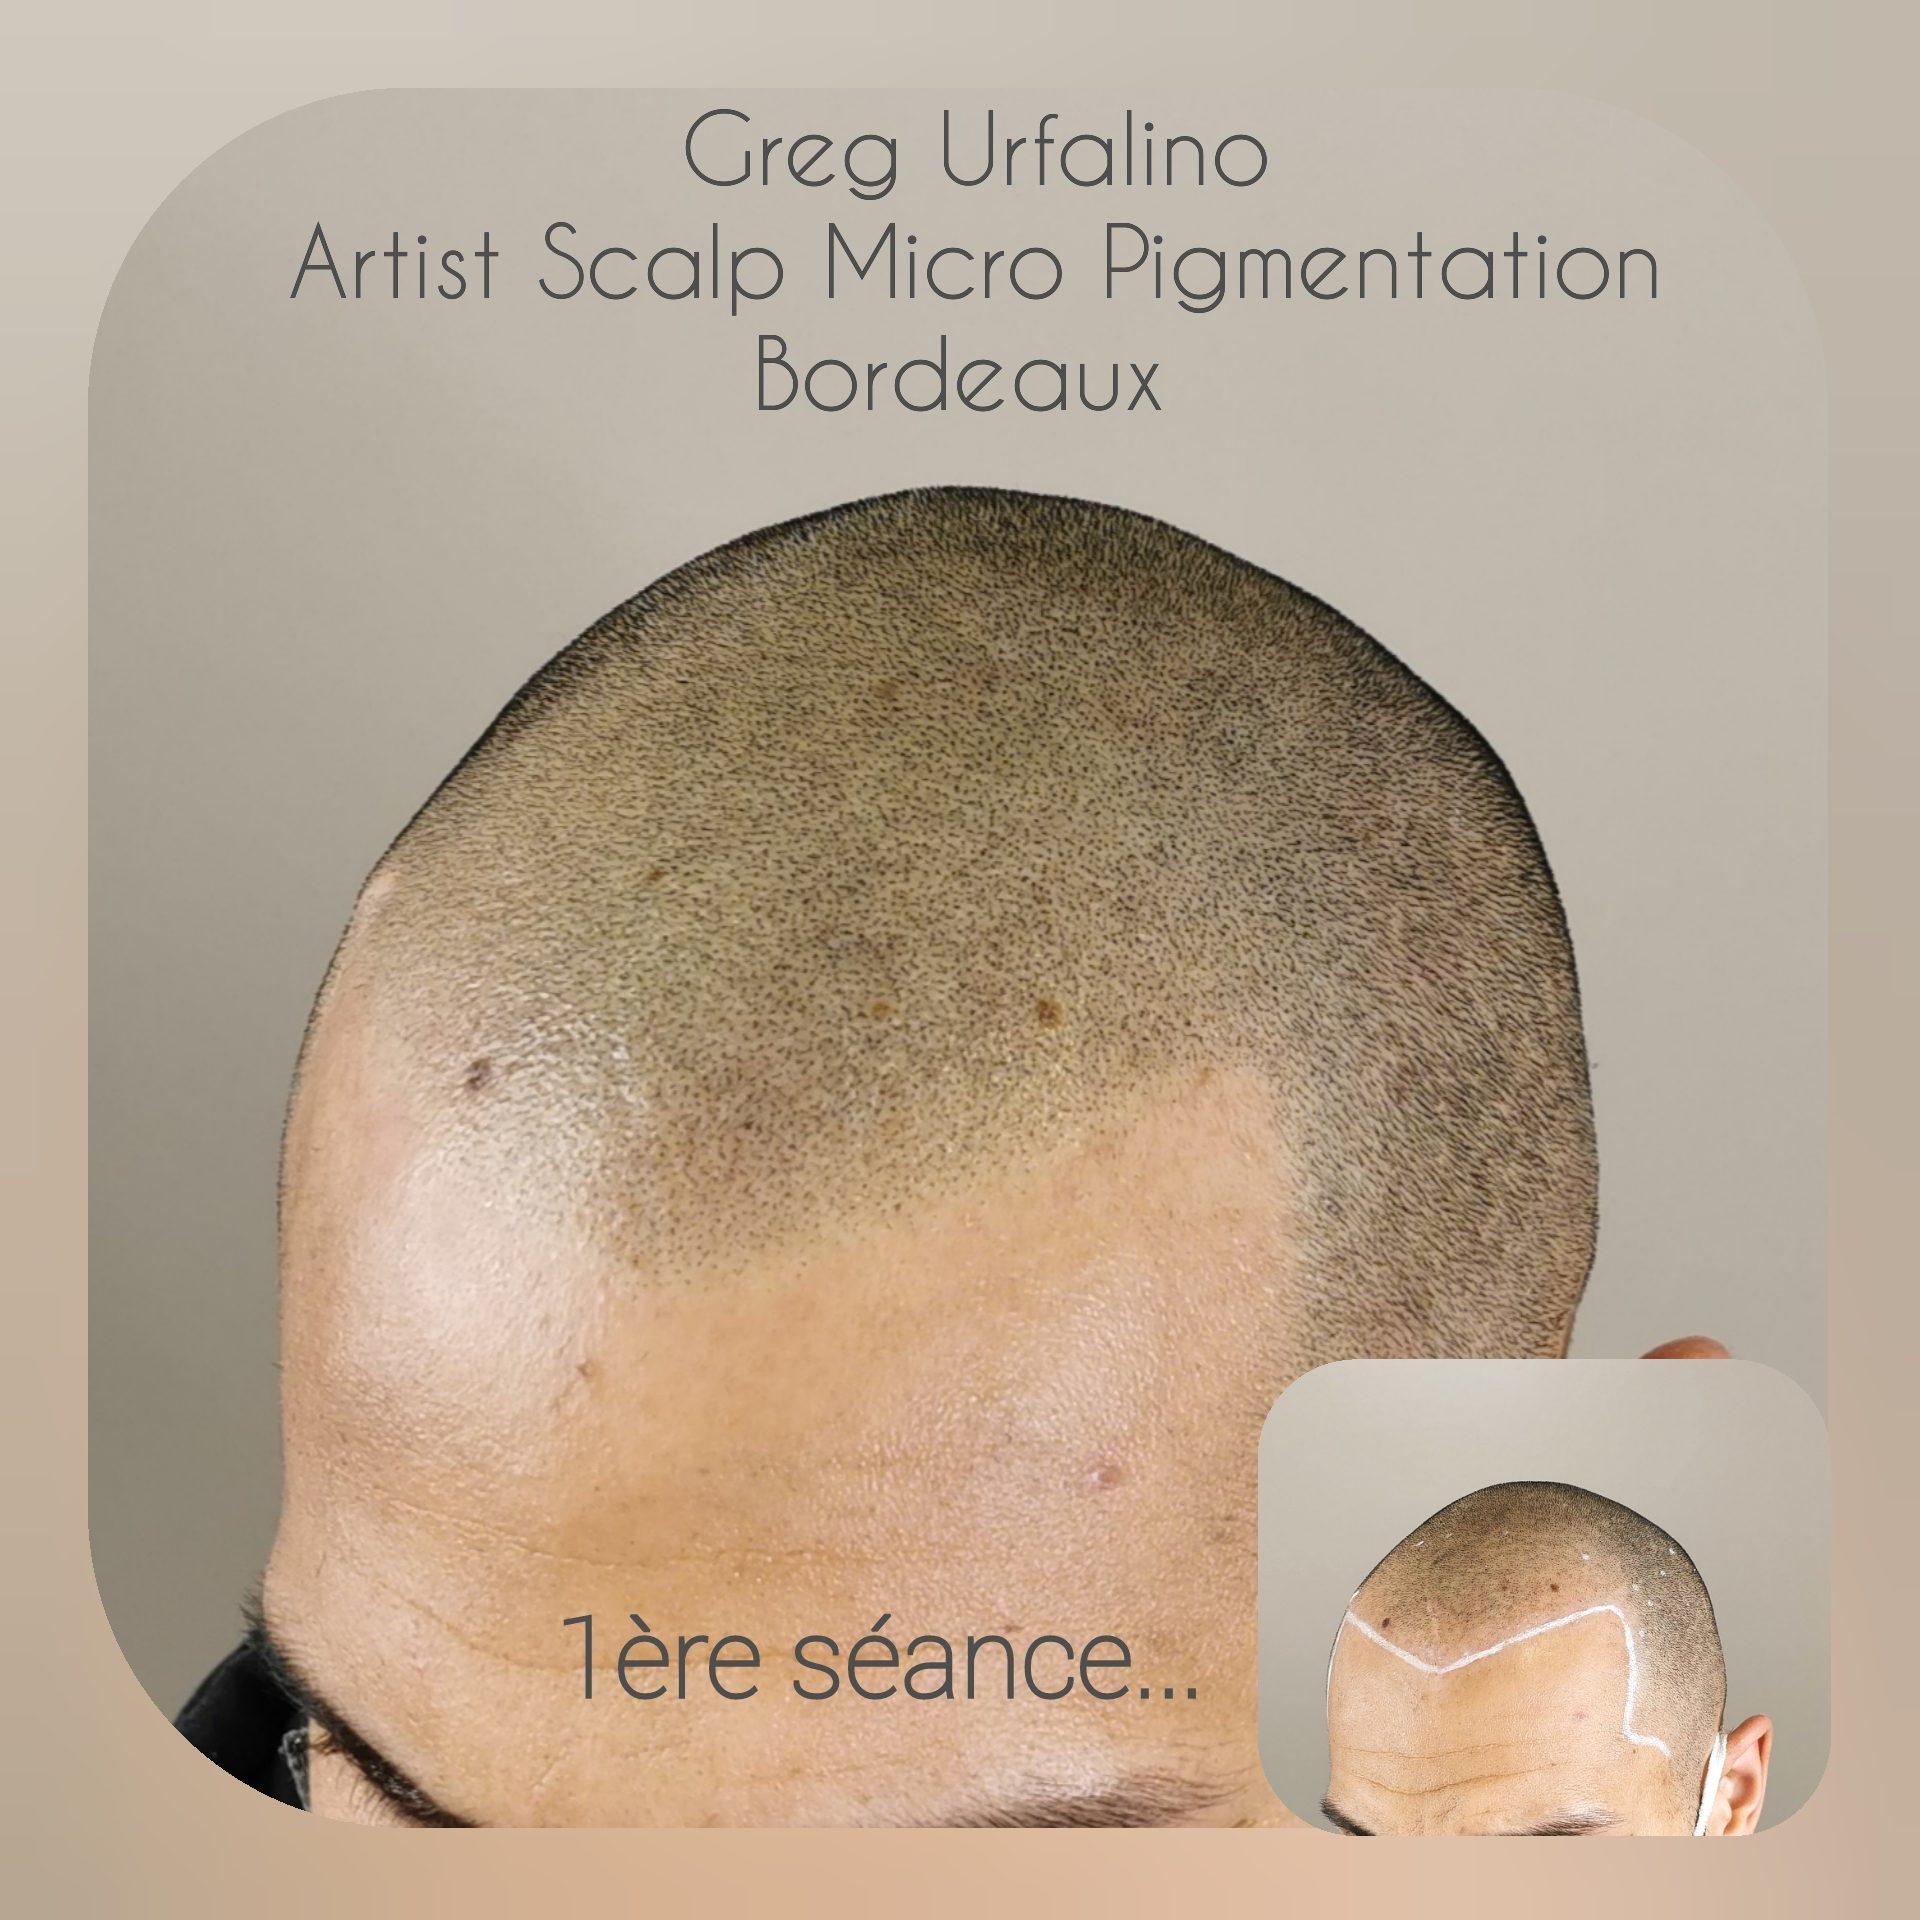 Greg Urfalino artist smp bordeaux #tricopigmentation #tricopigmentationbordeaux #smpbordeaux #tricopigmentation #artisttatoo #bordeaux #tricopigmentationfrance #tatouagecuirchevelu #smp #pigmentbioresorbable #greffecapillaire